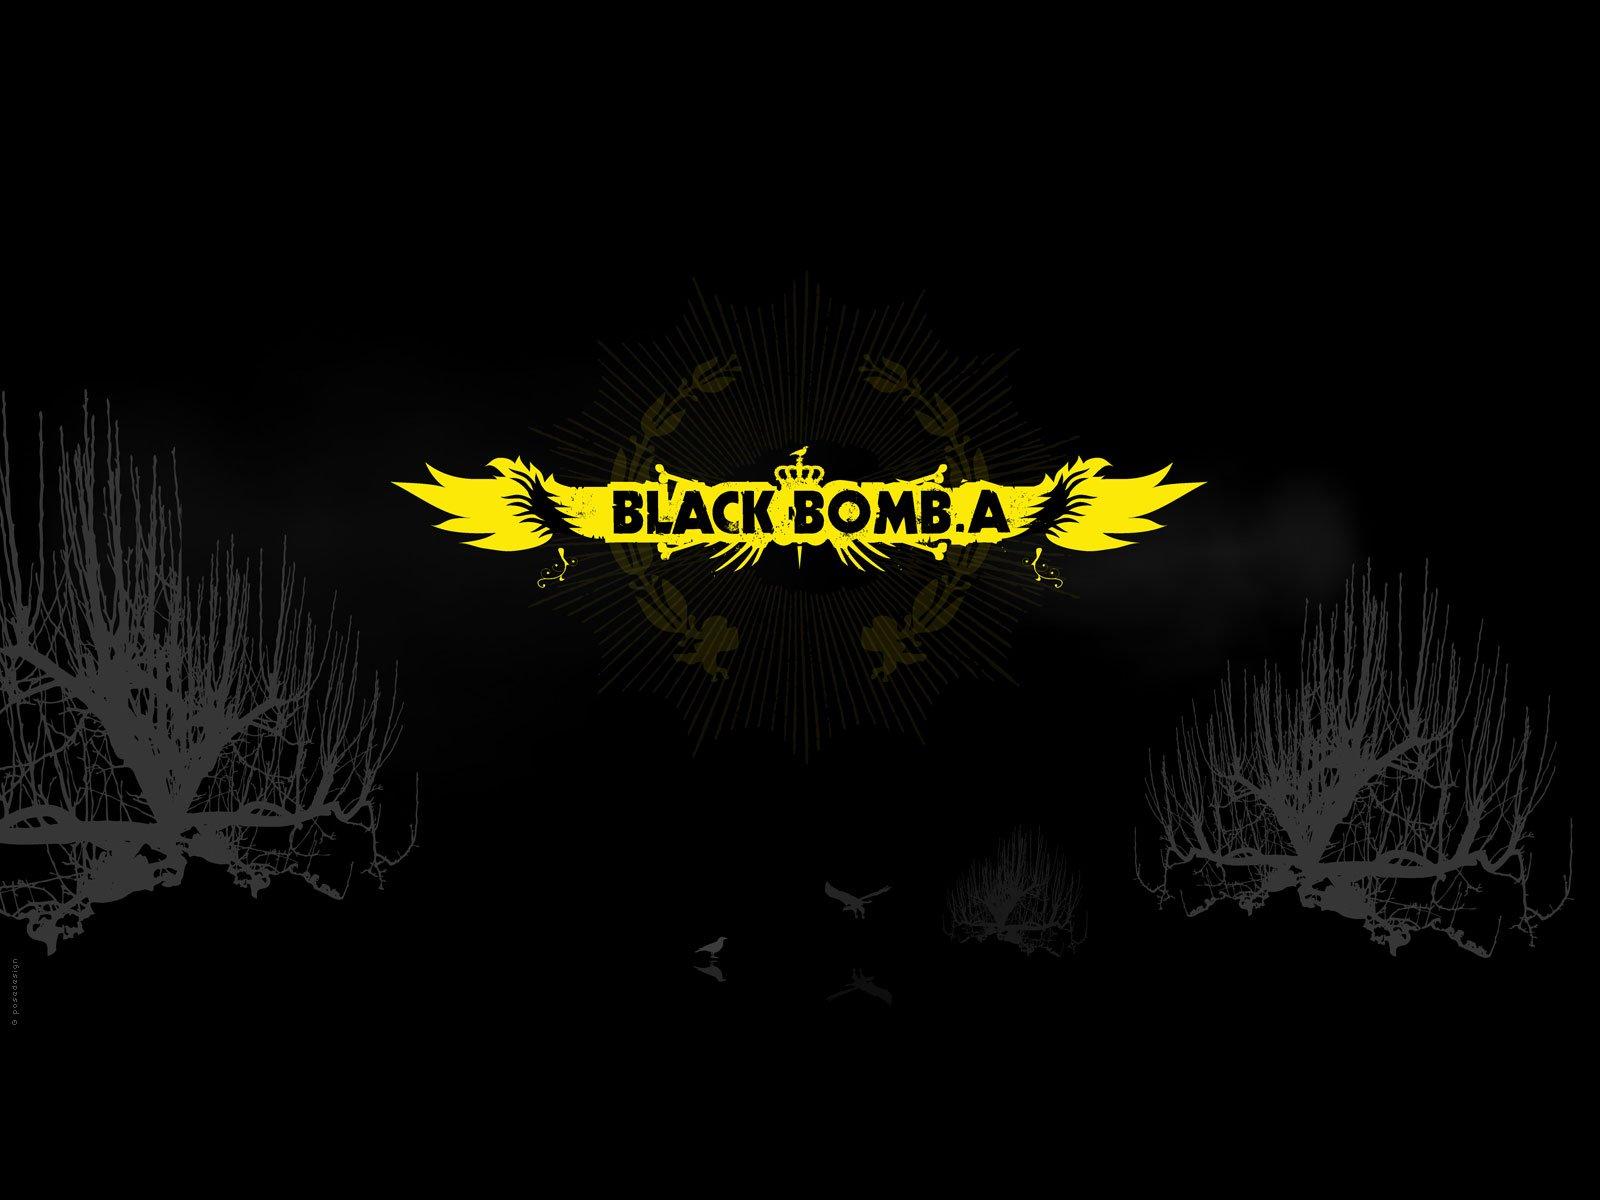 wallpaper logo hitam, wallpaper logo apel hitam, wallpaper logo ops 2 hitam, wallpaper logo windows hitam, wallpaper logo blackberry hitam,